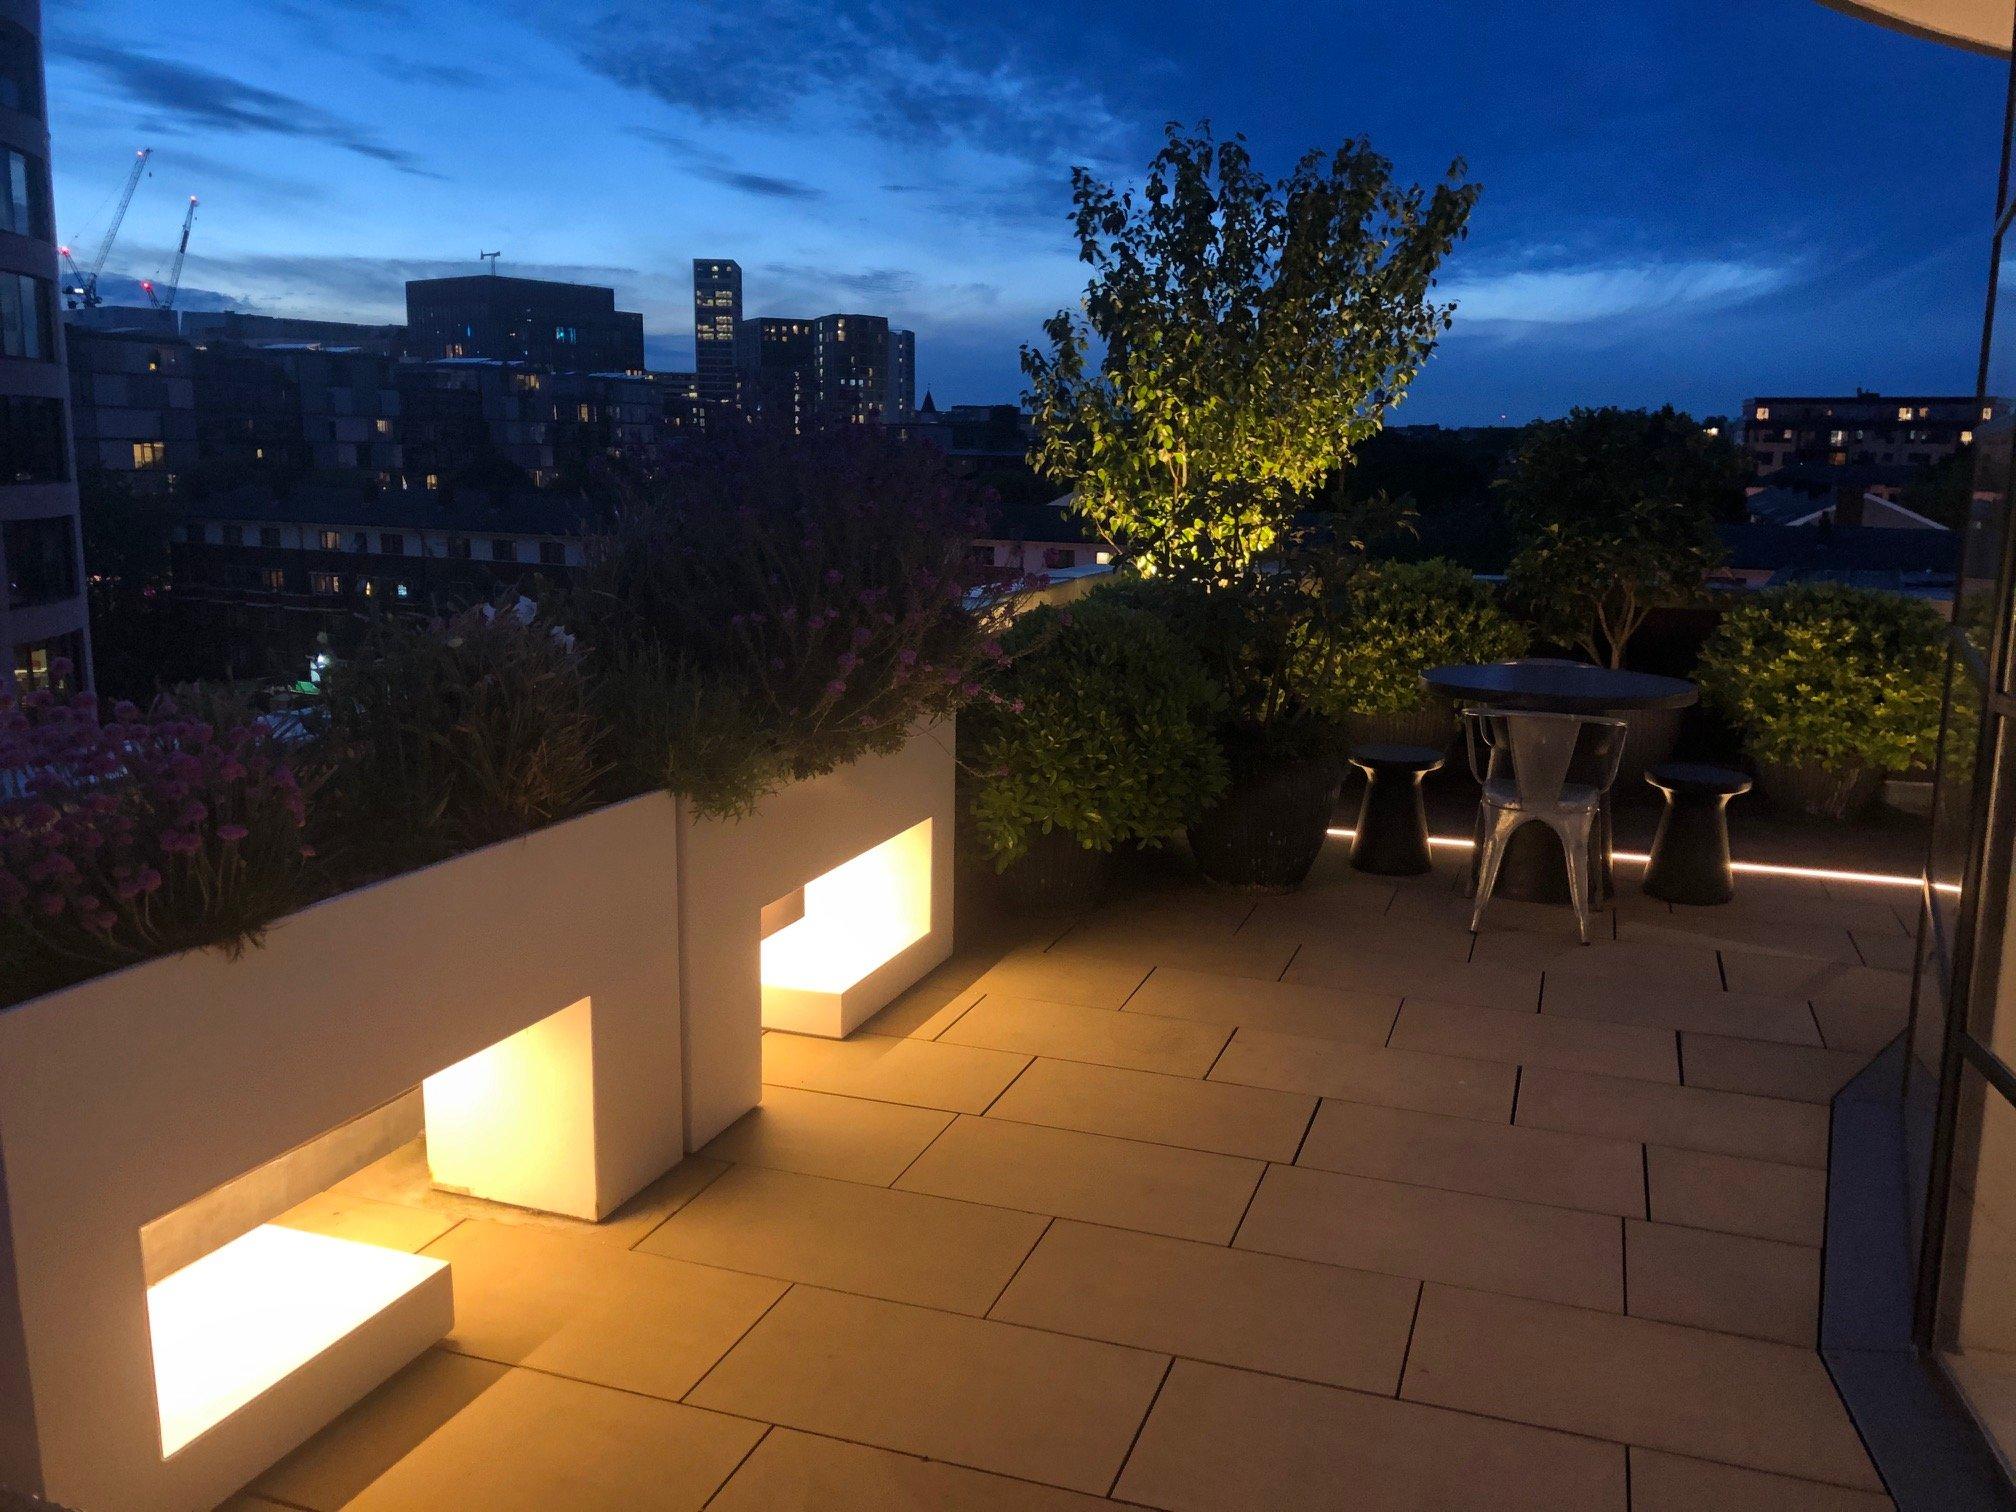 IMG 4303 - Garden Lighting Systems Part 2